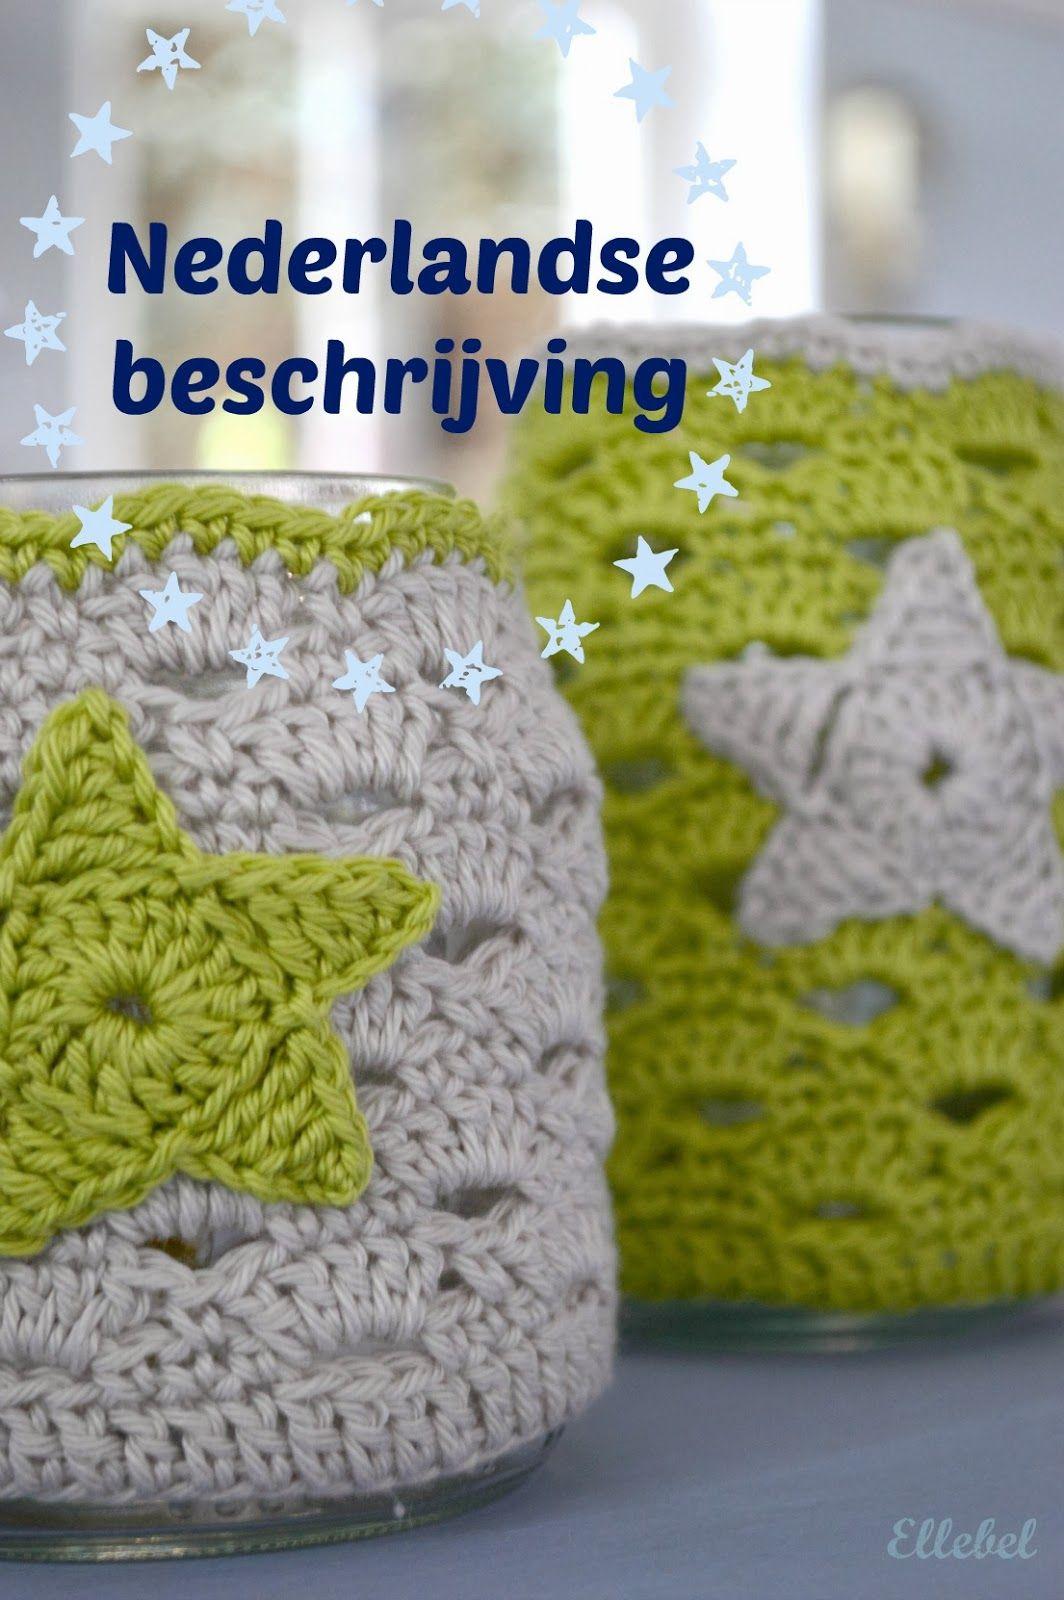 Ellebel: Beschrijving sfeerlichtje NL | Handavinna | Pinterest ...